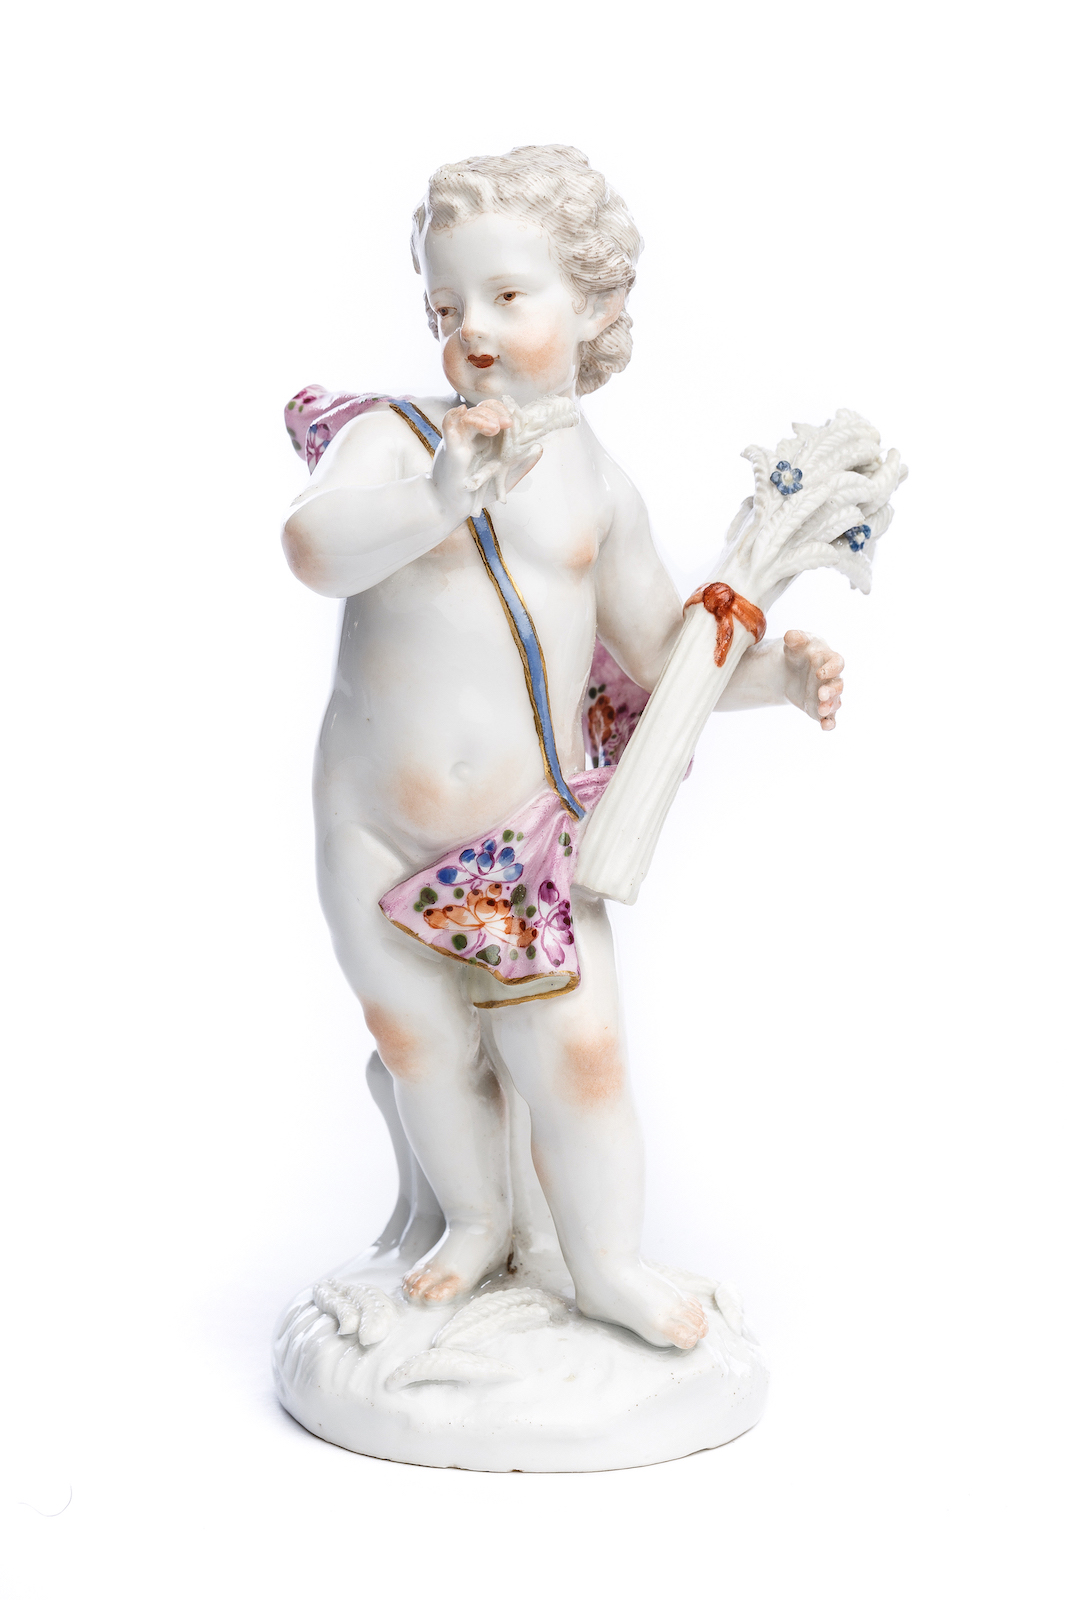 #184 Porzellanfigur Image